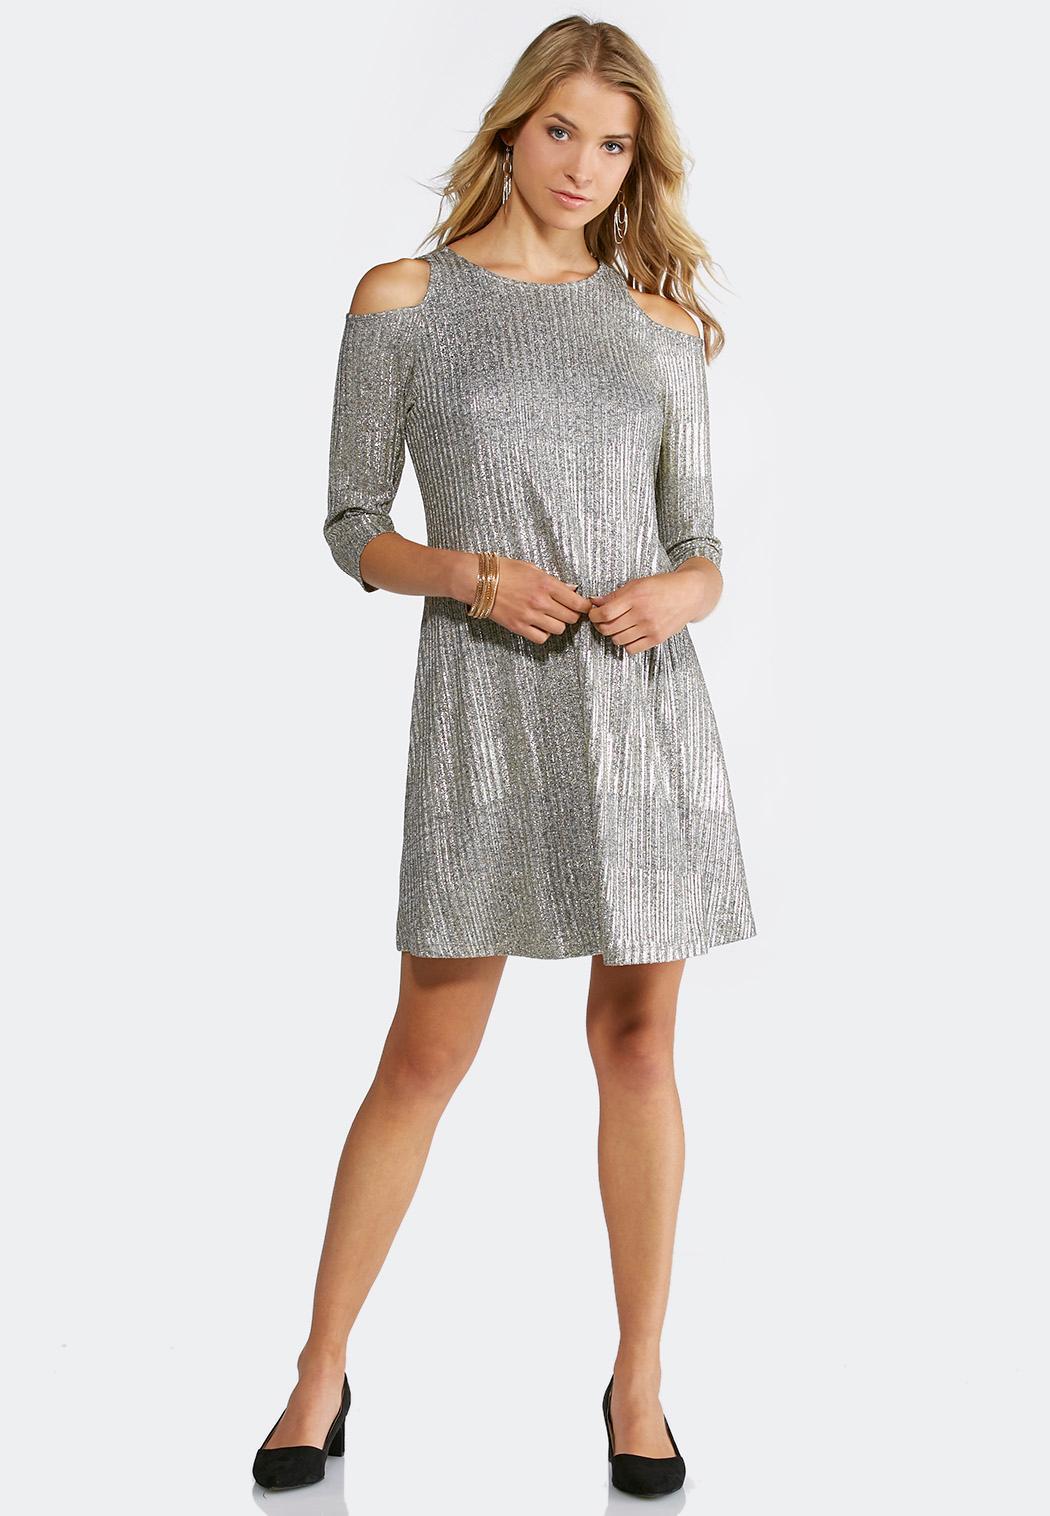 plus size cold shoulder metallic swing dress a-line & swing cato